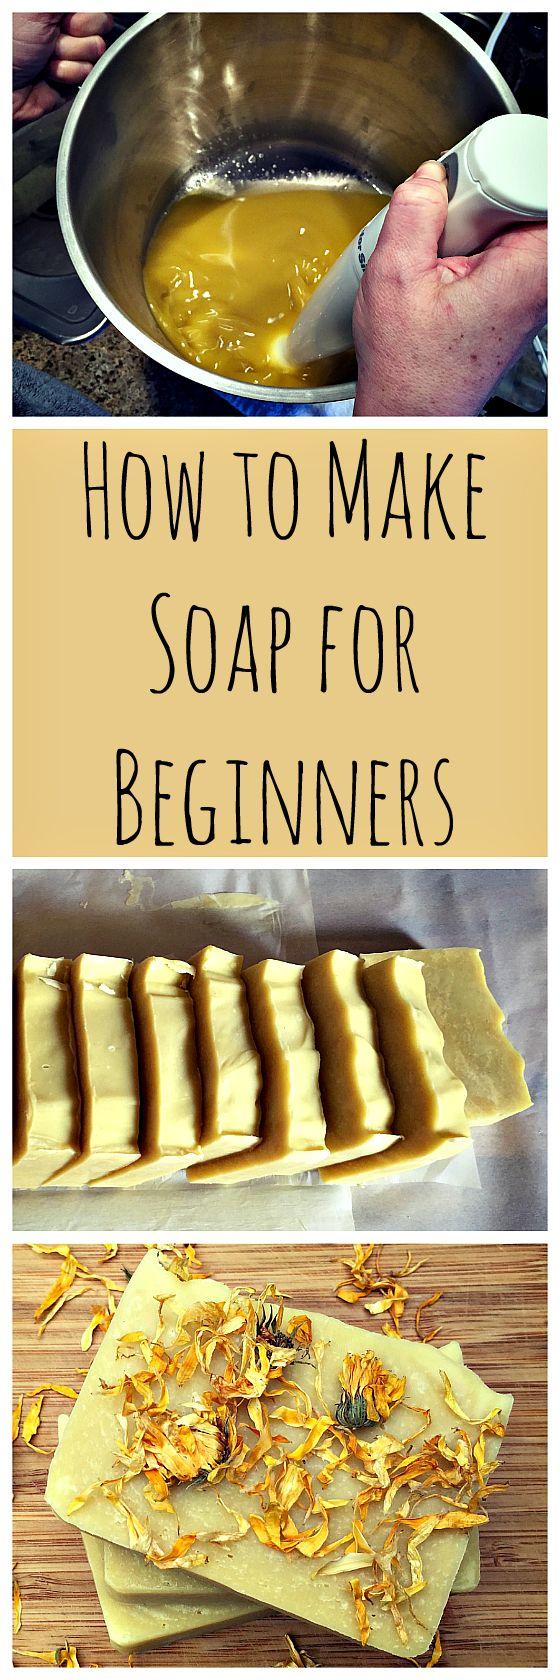 Homemade Calendula Soap A recipe and guide for beginners